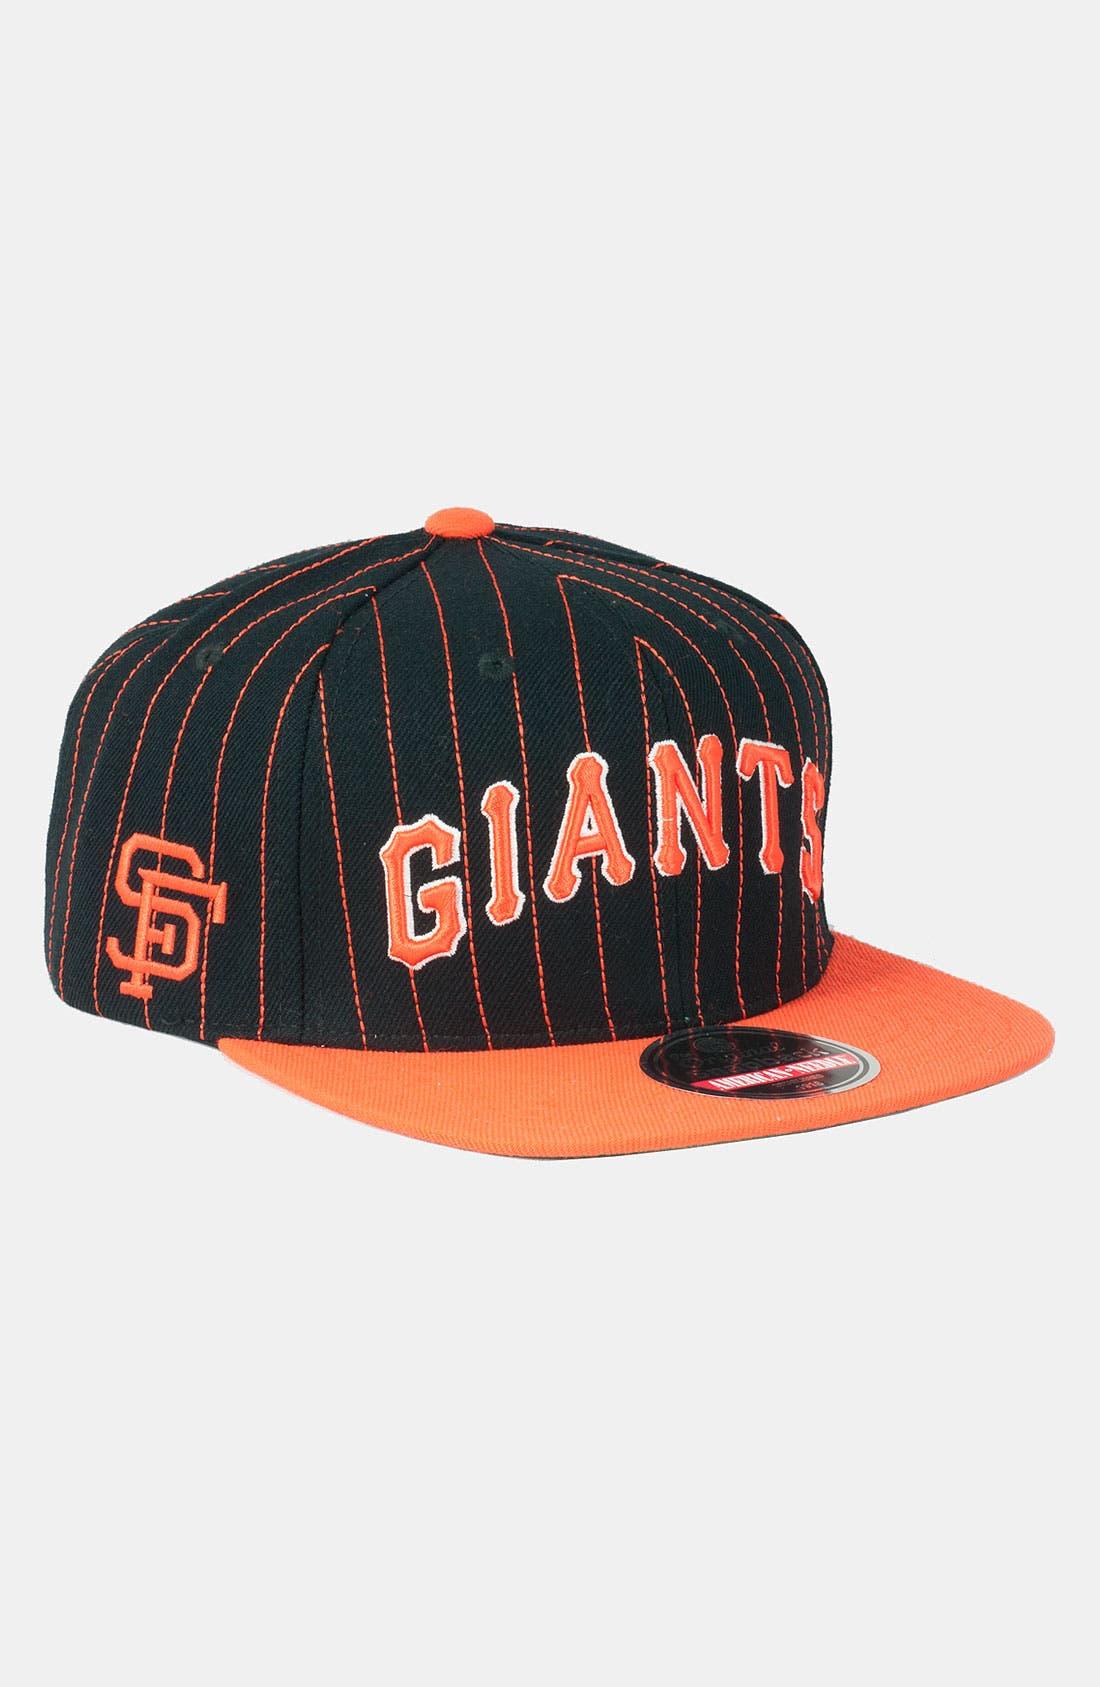 Main Image - American Needle 'Giants' Snapback Baseball Cap